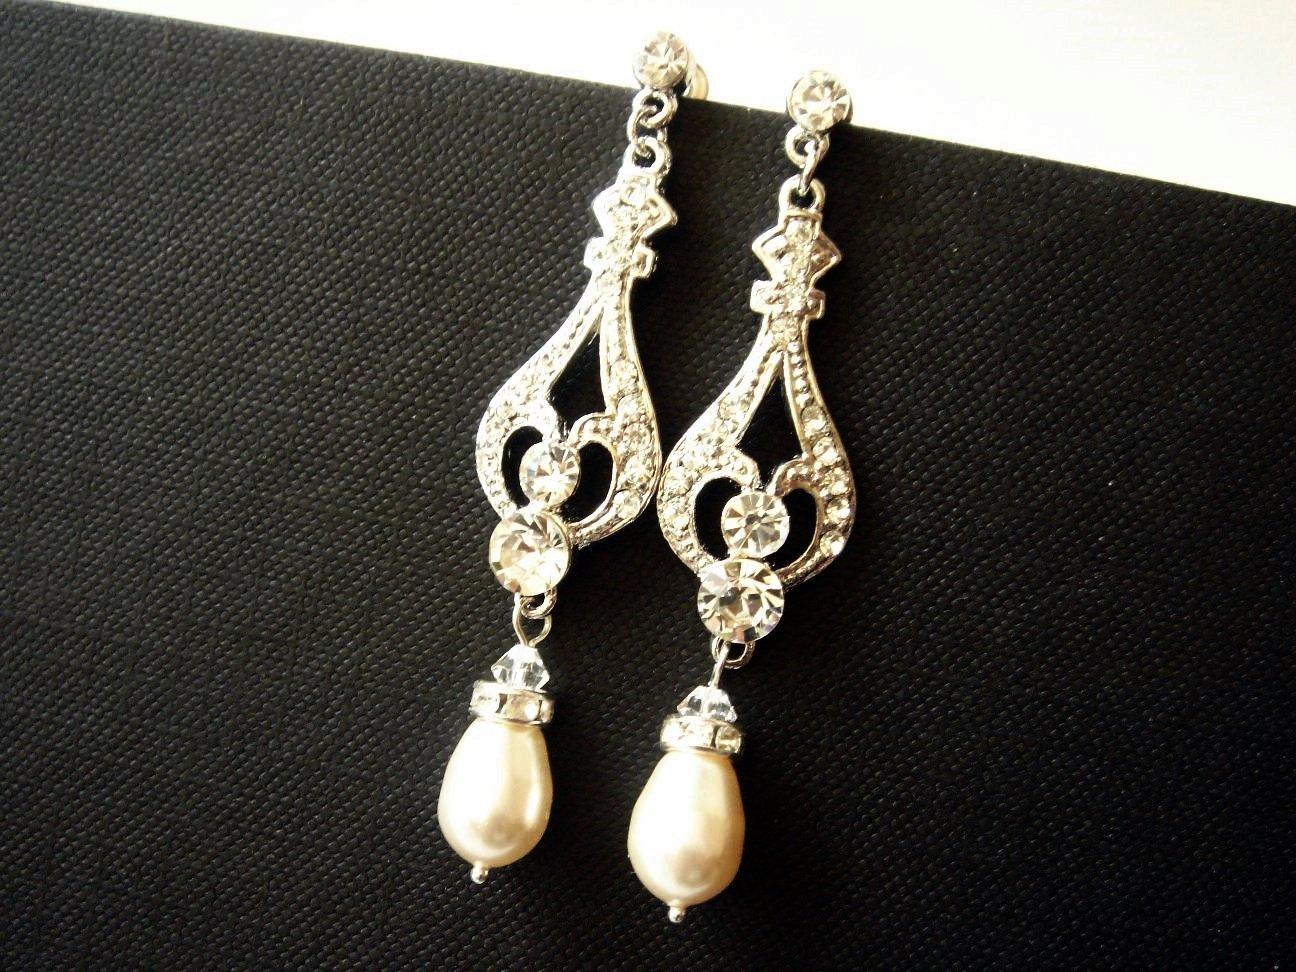 Long Bridal Swarovski Pearl Earrings - Theme Wedding E031